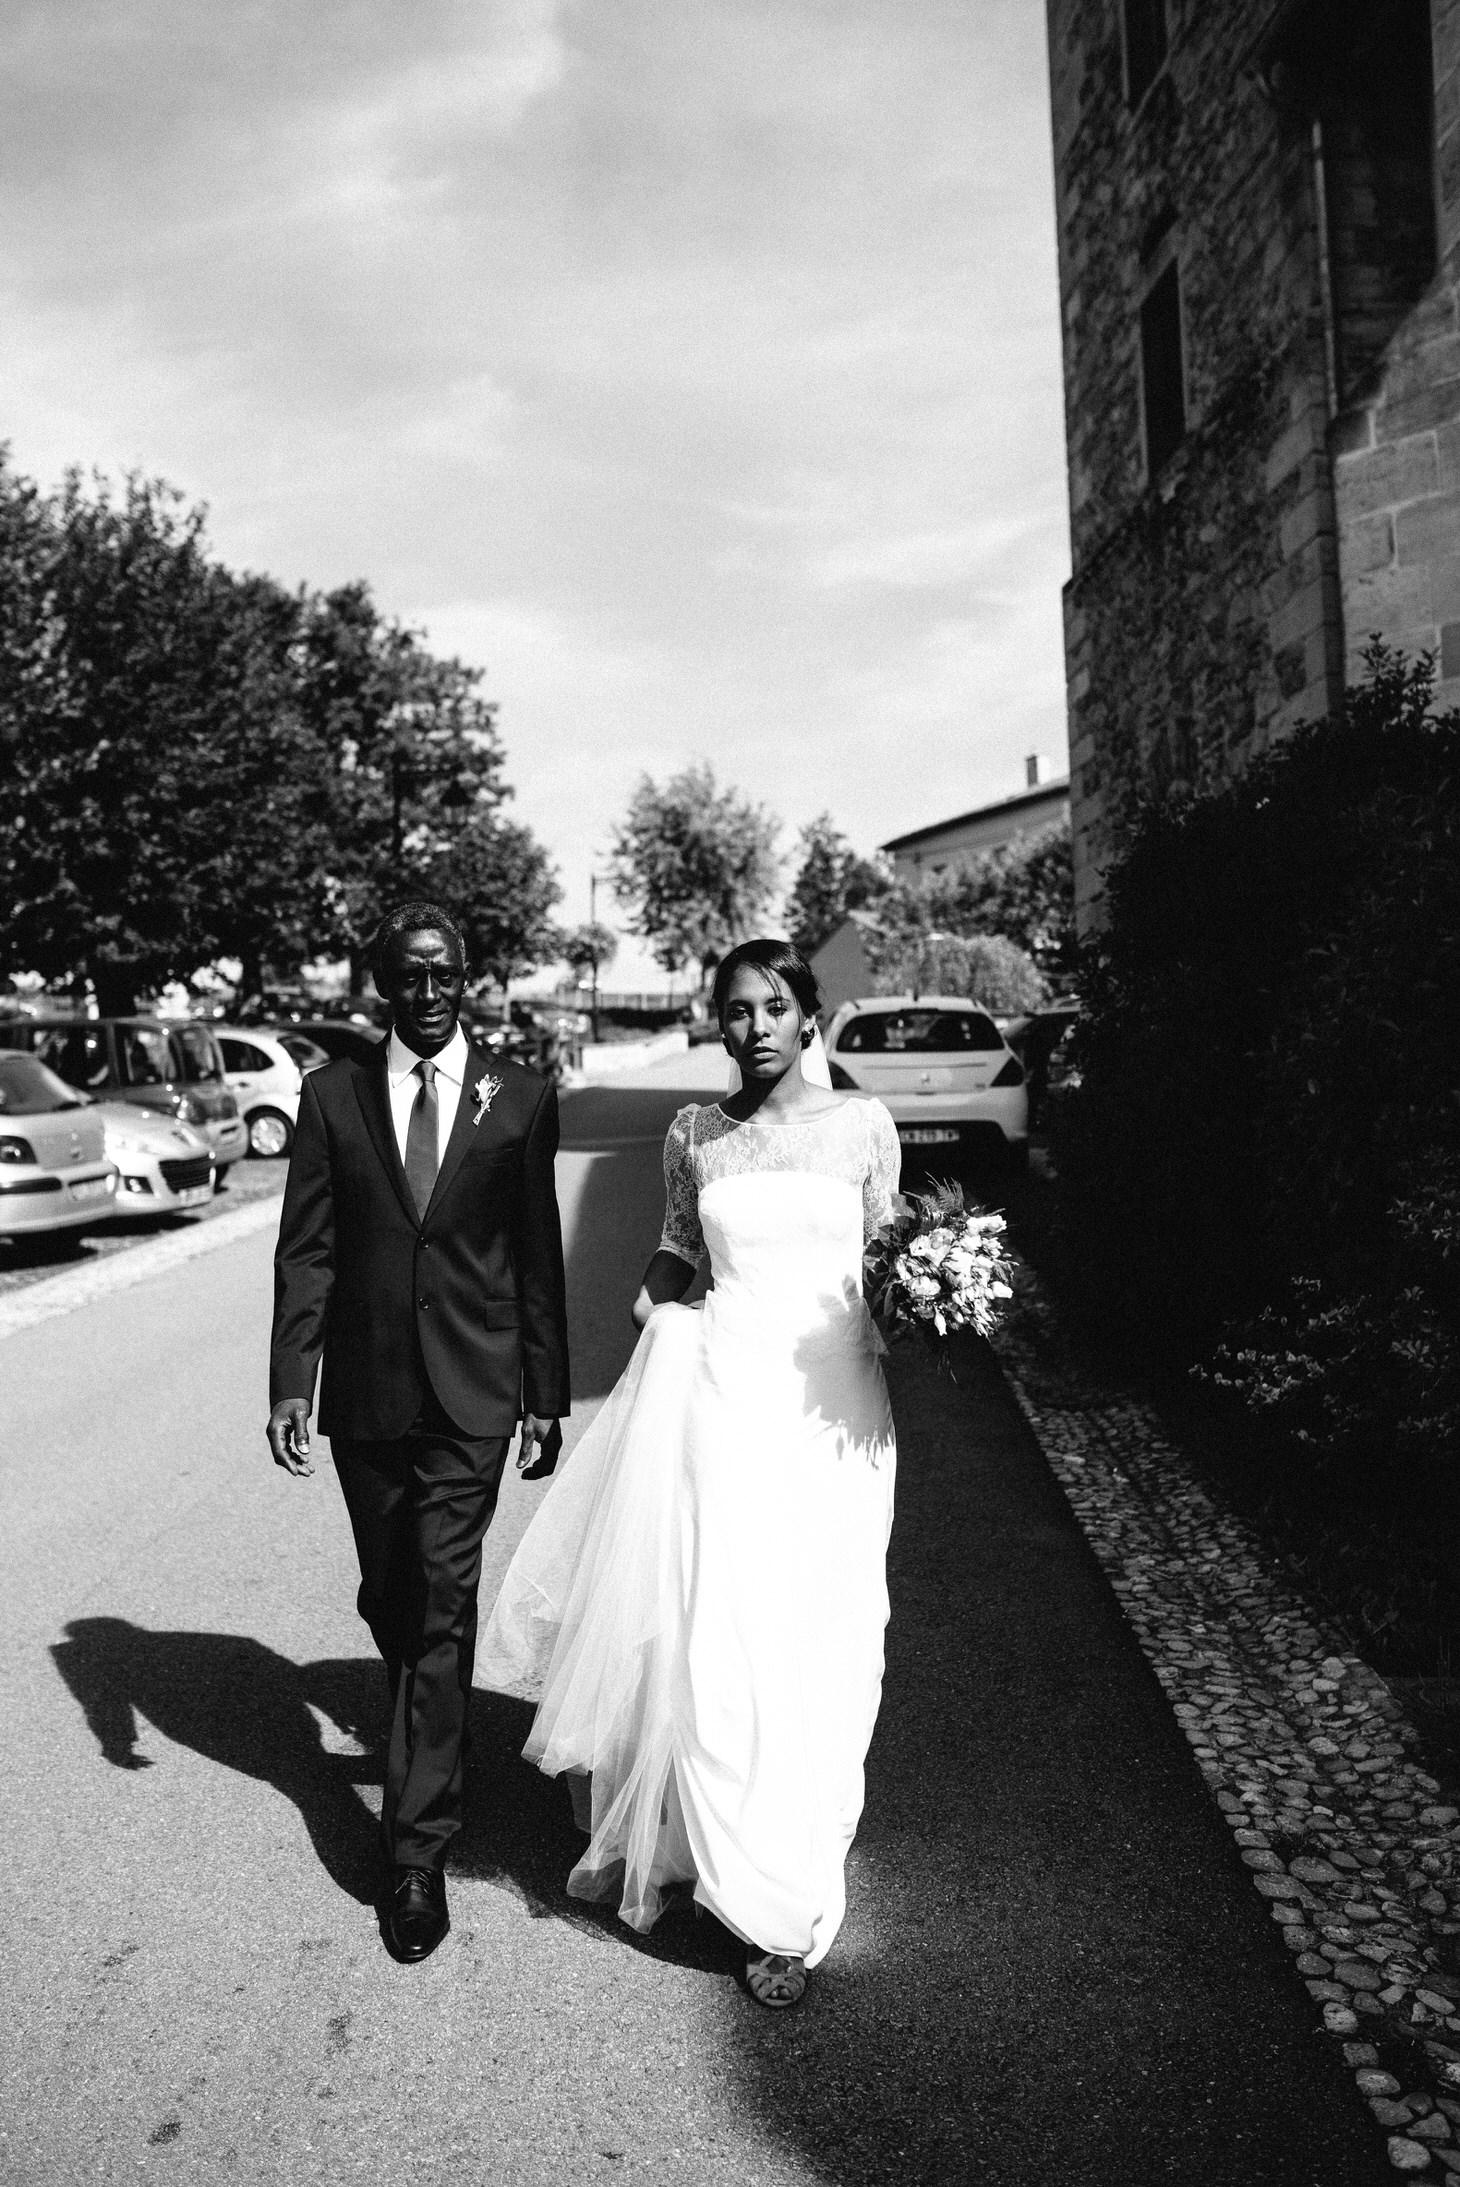 photographe-mariage-lyon-0231